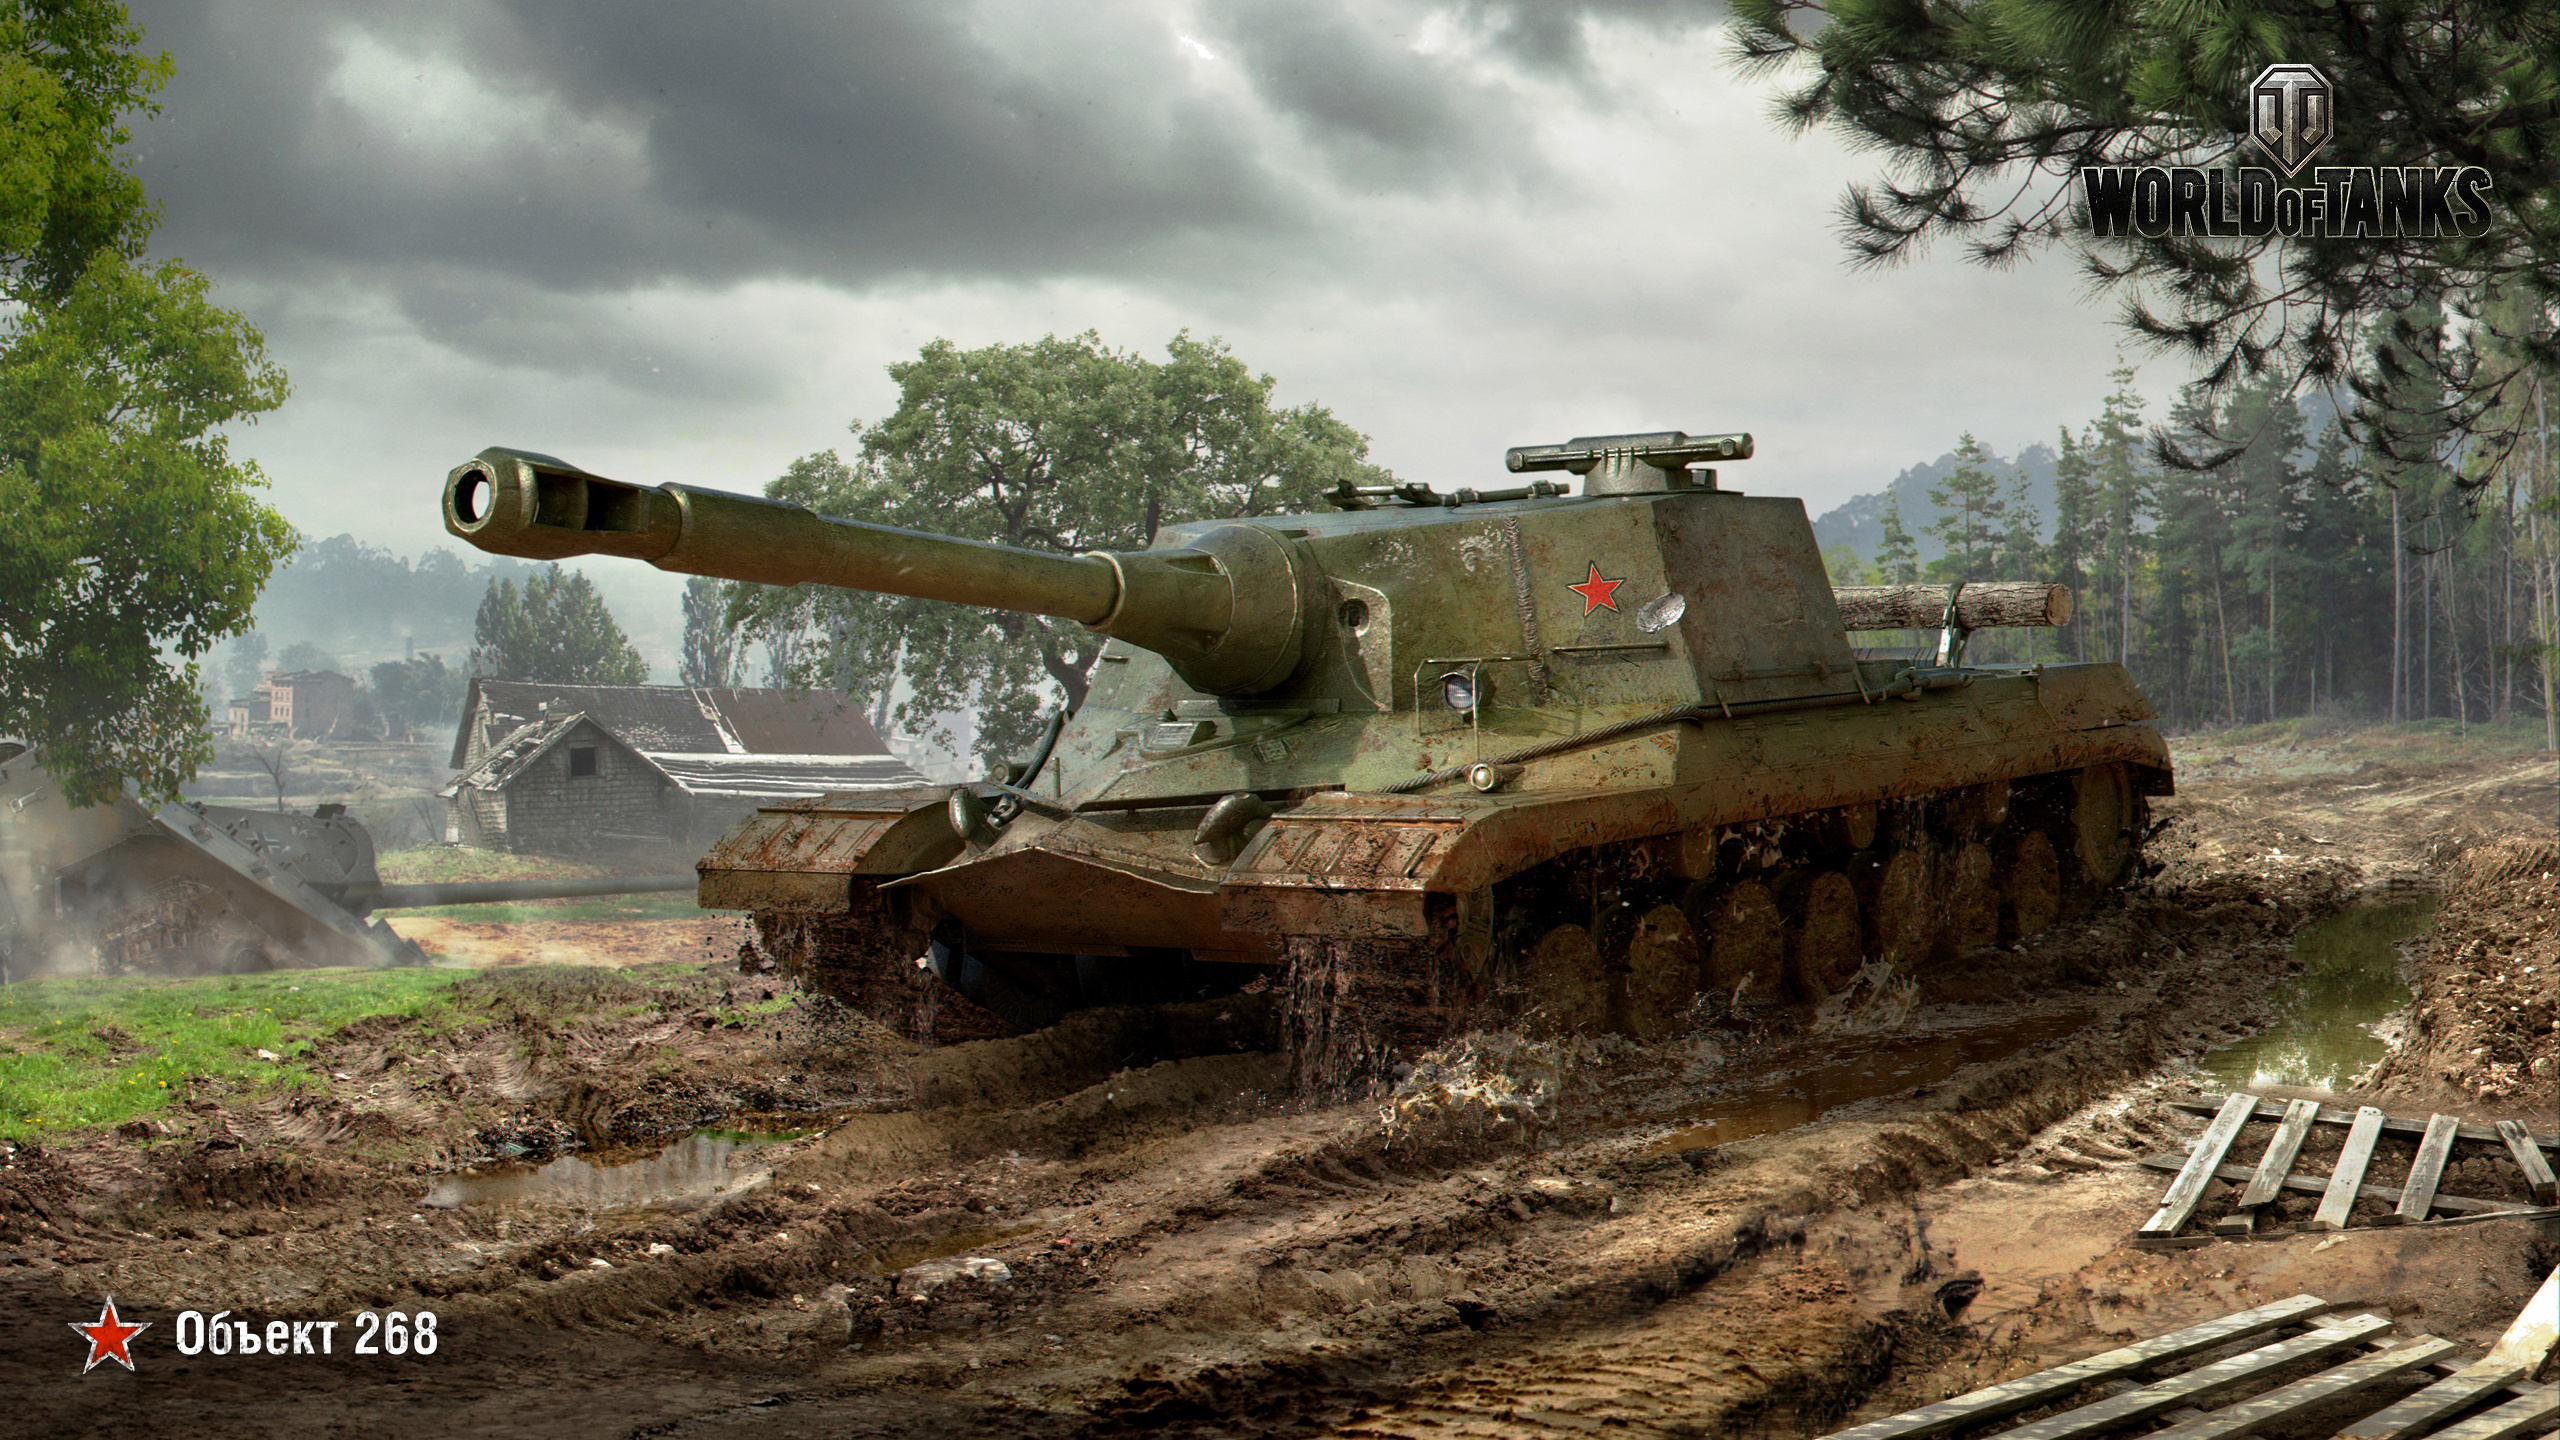 Объект 268: советский гигант